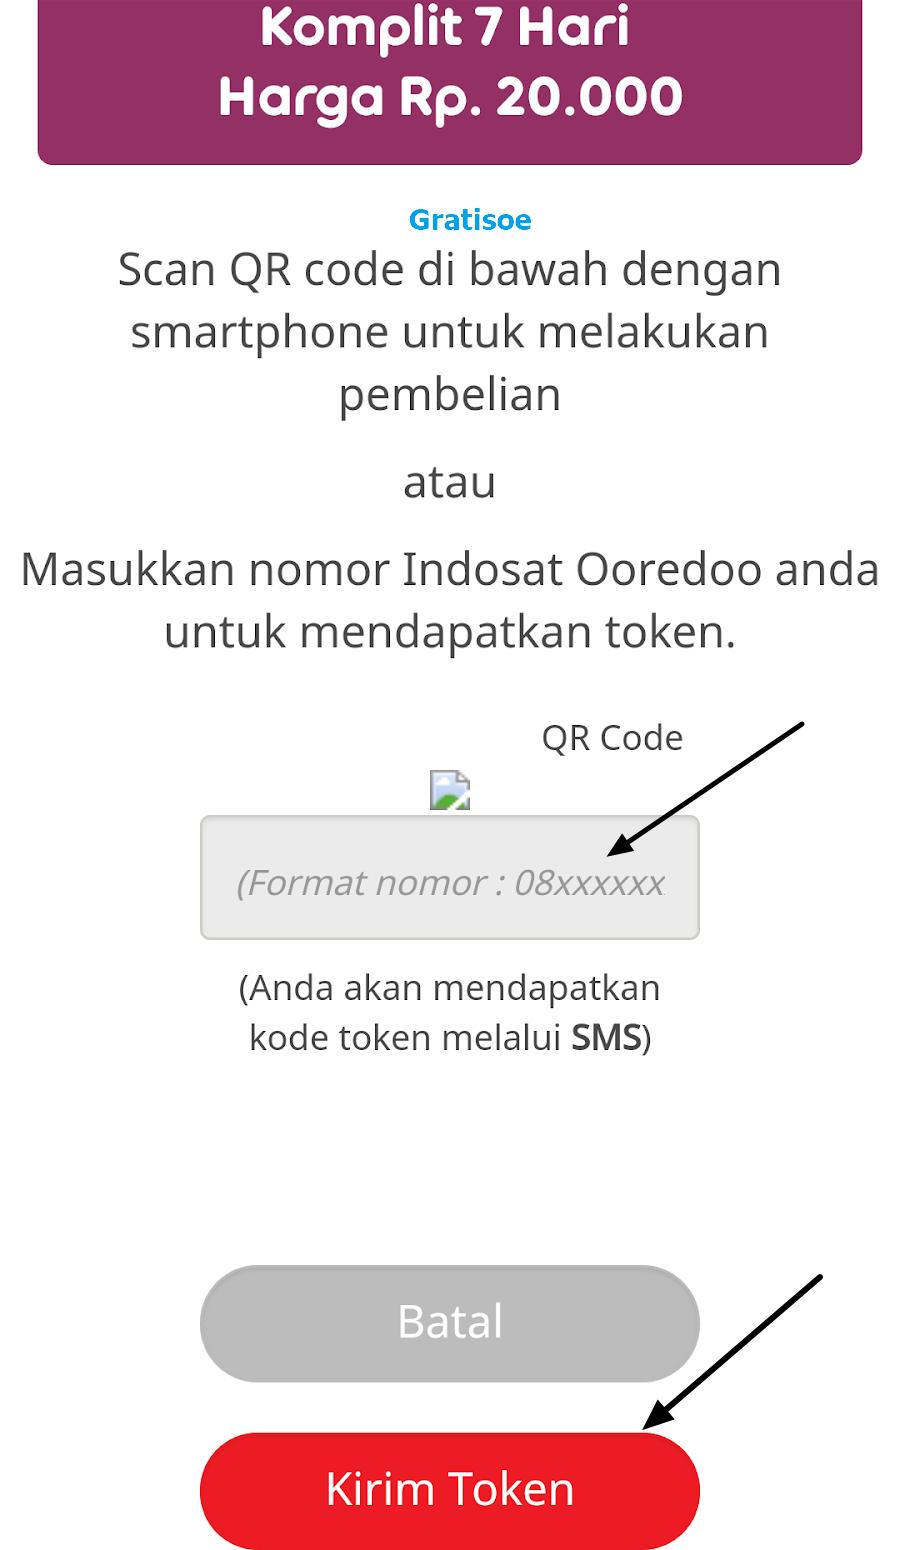 Tembak Paket Indosat Ooredoo 7 Hari Unlimited Gratis Online Im3 Rp0 Masukkan Nomer